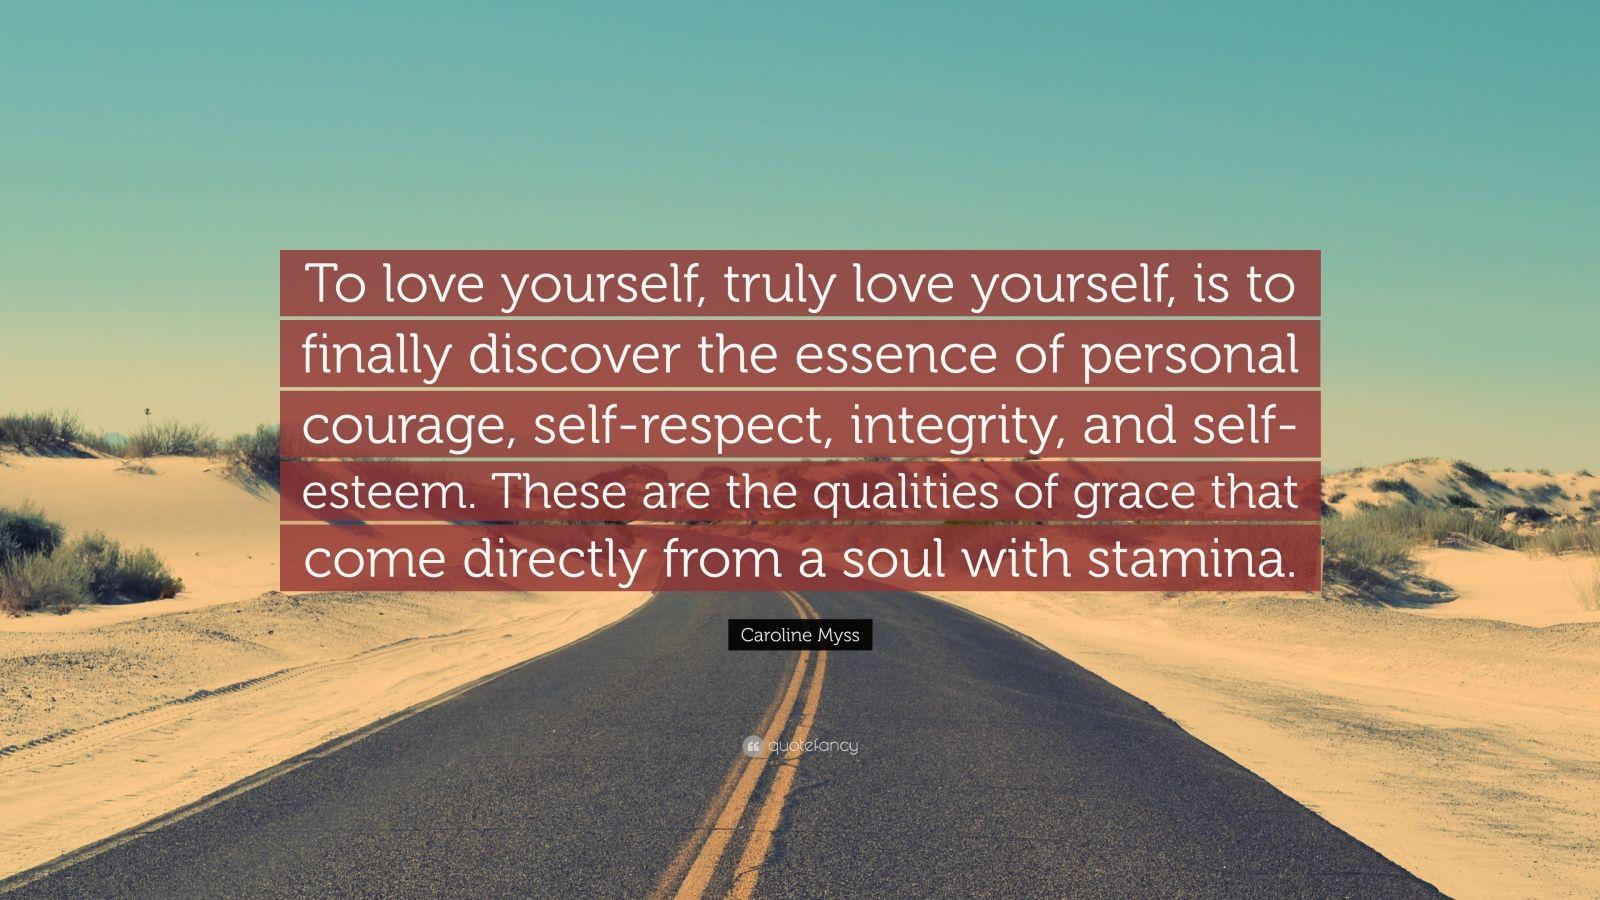 Inspiring Relationship Quotes Wallpaper Self Esteem Quotes 40 Wallpapers Quotefancy